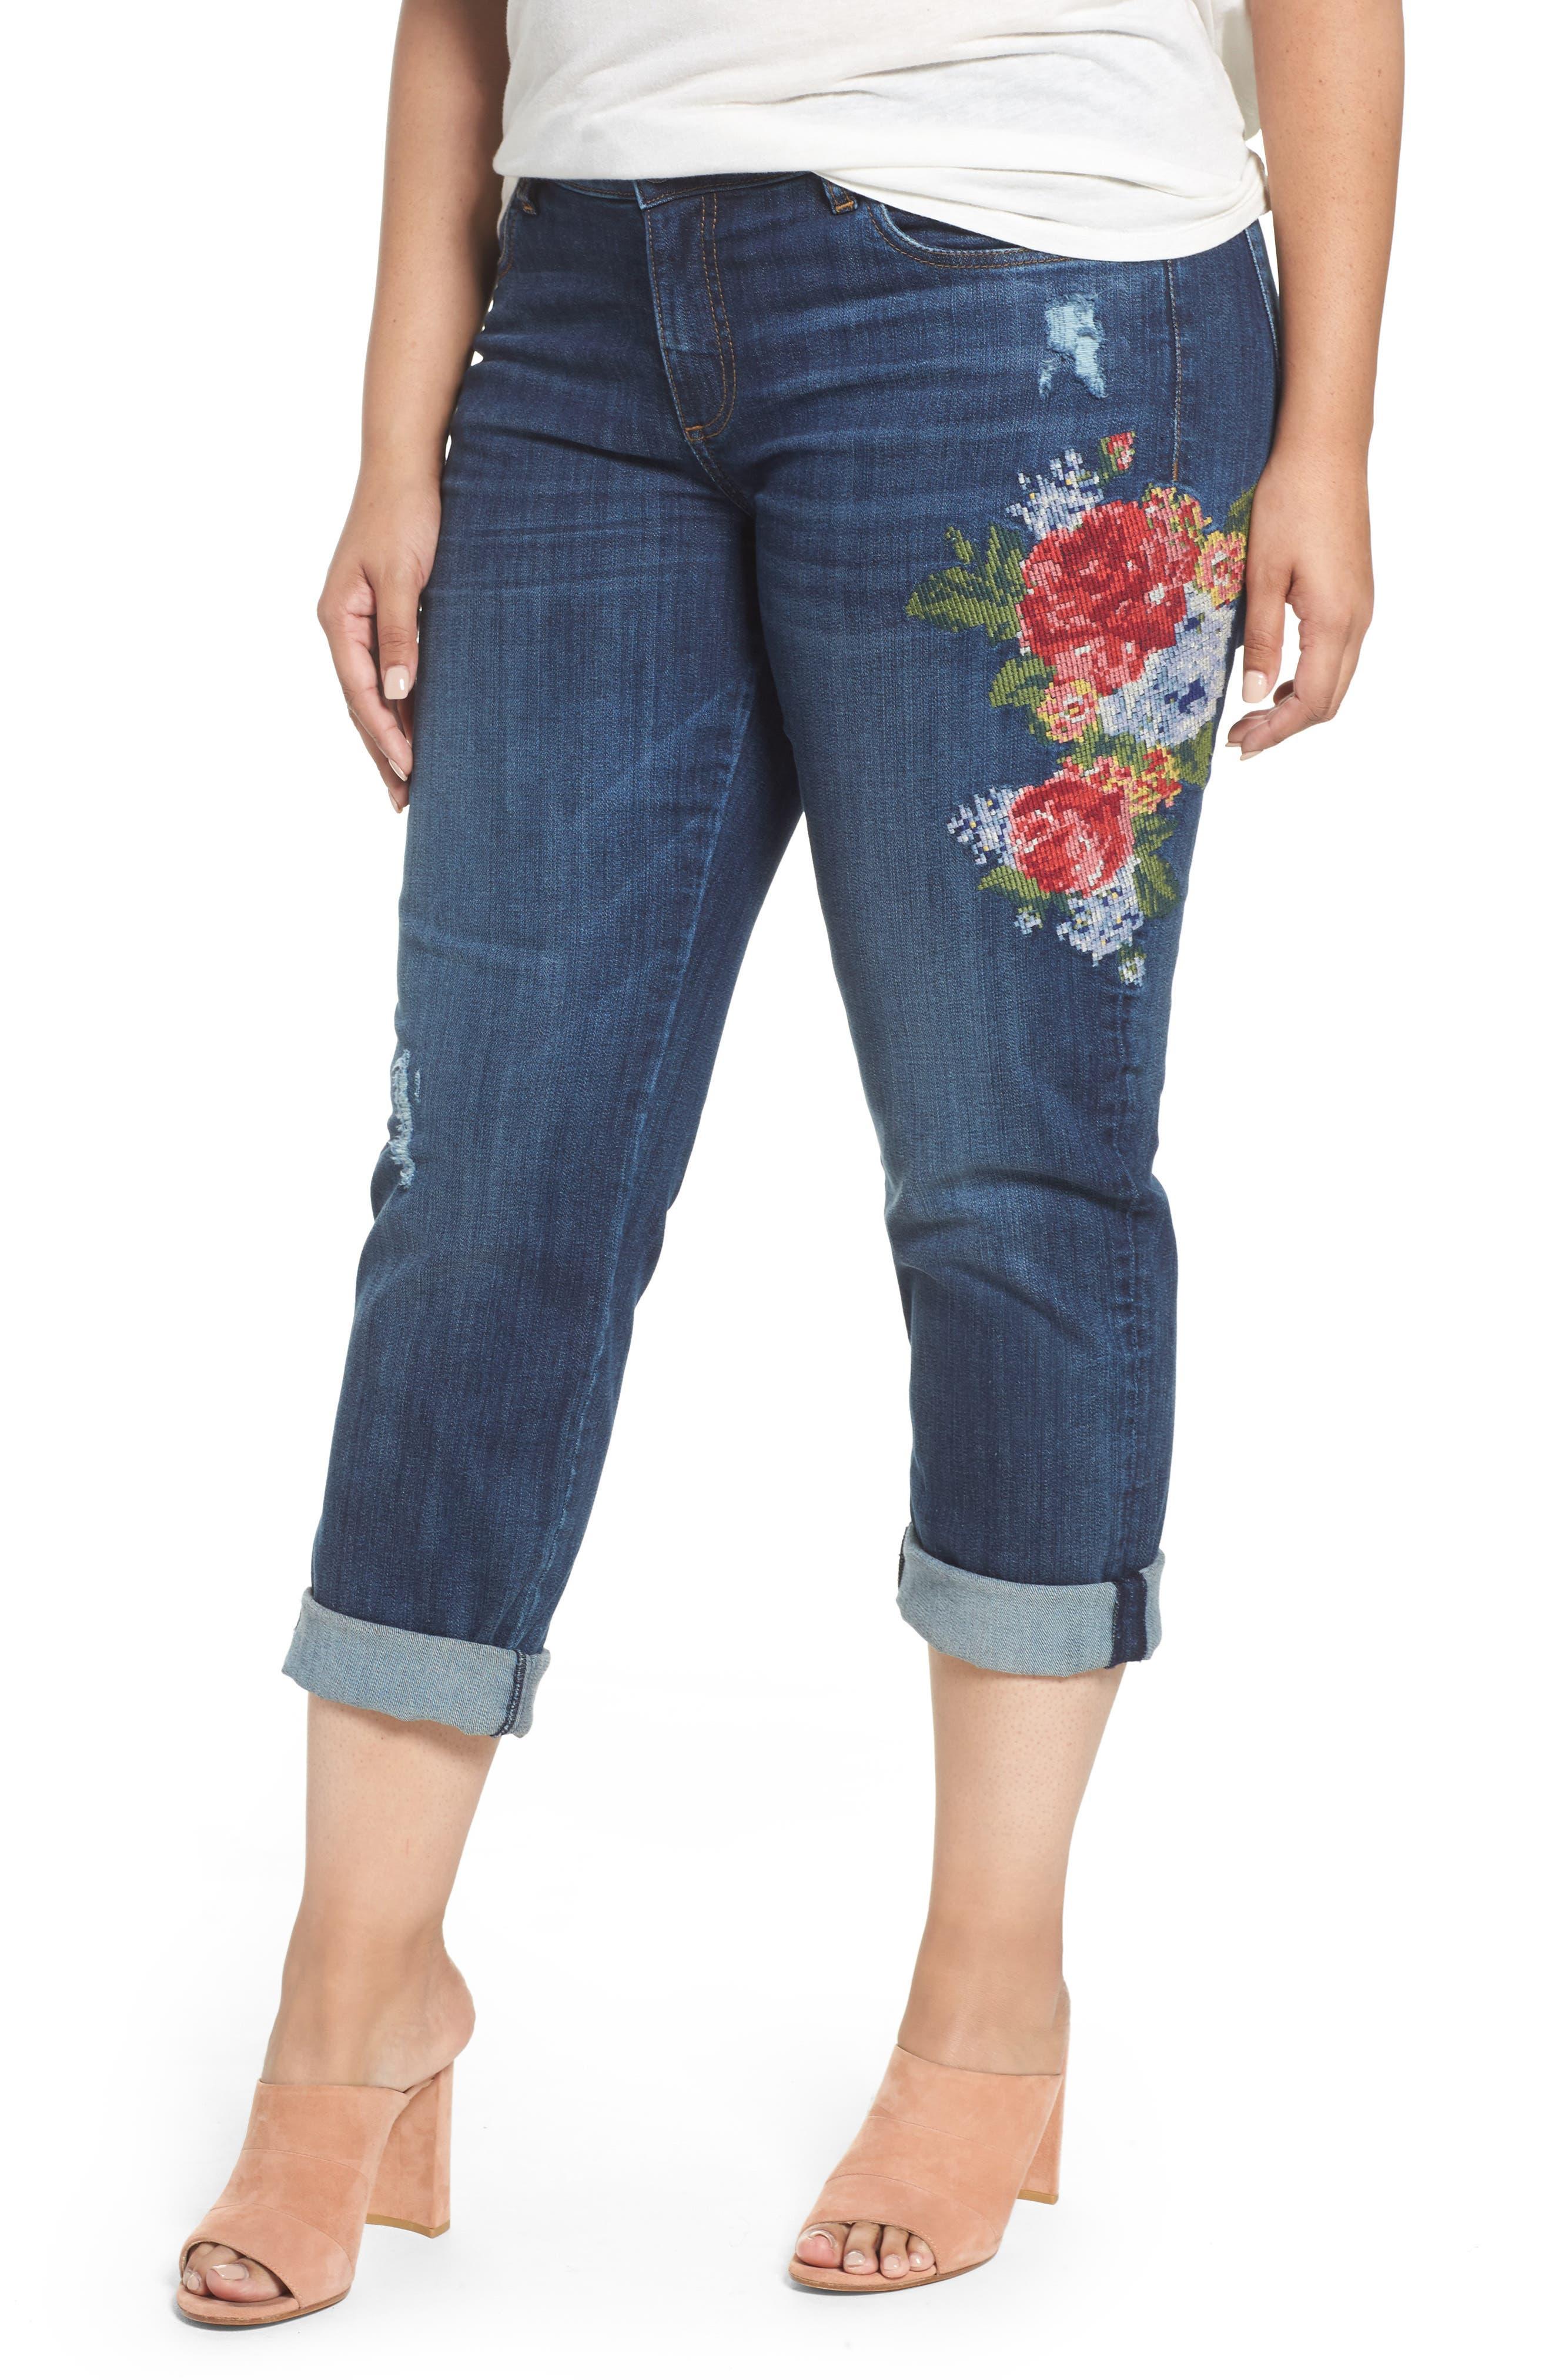 KUT from the Kloth Catherine Embroidered Boyfriend Jeans (Premier Dark) (Plus Size)